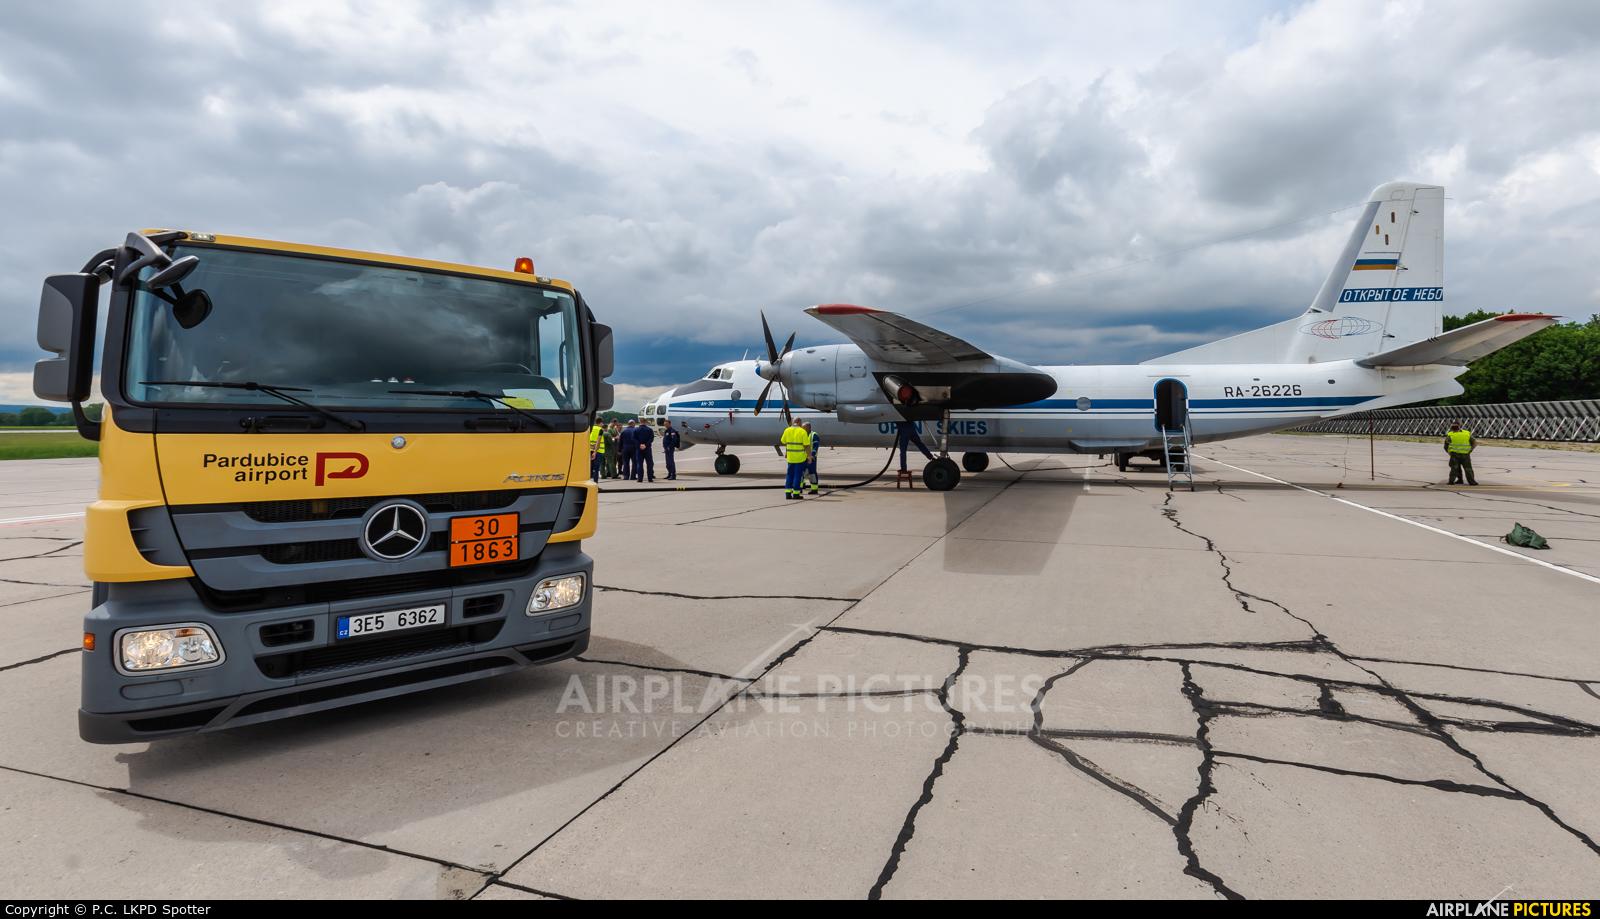 Russia - Air Force RA-26226 aircraft at Pardubice